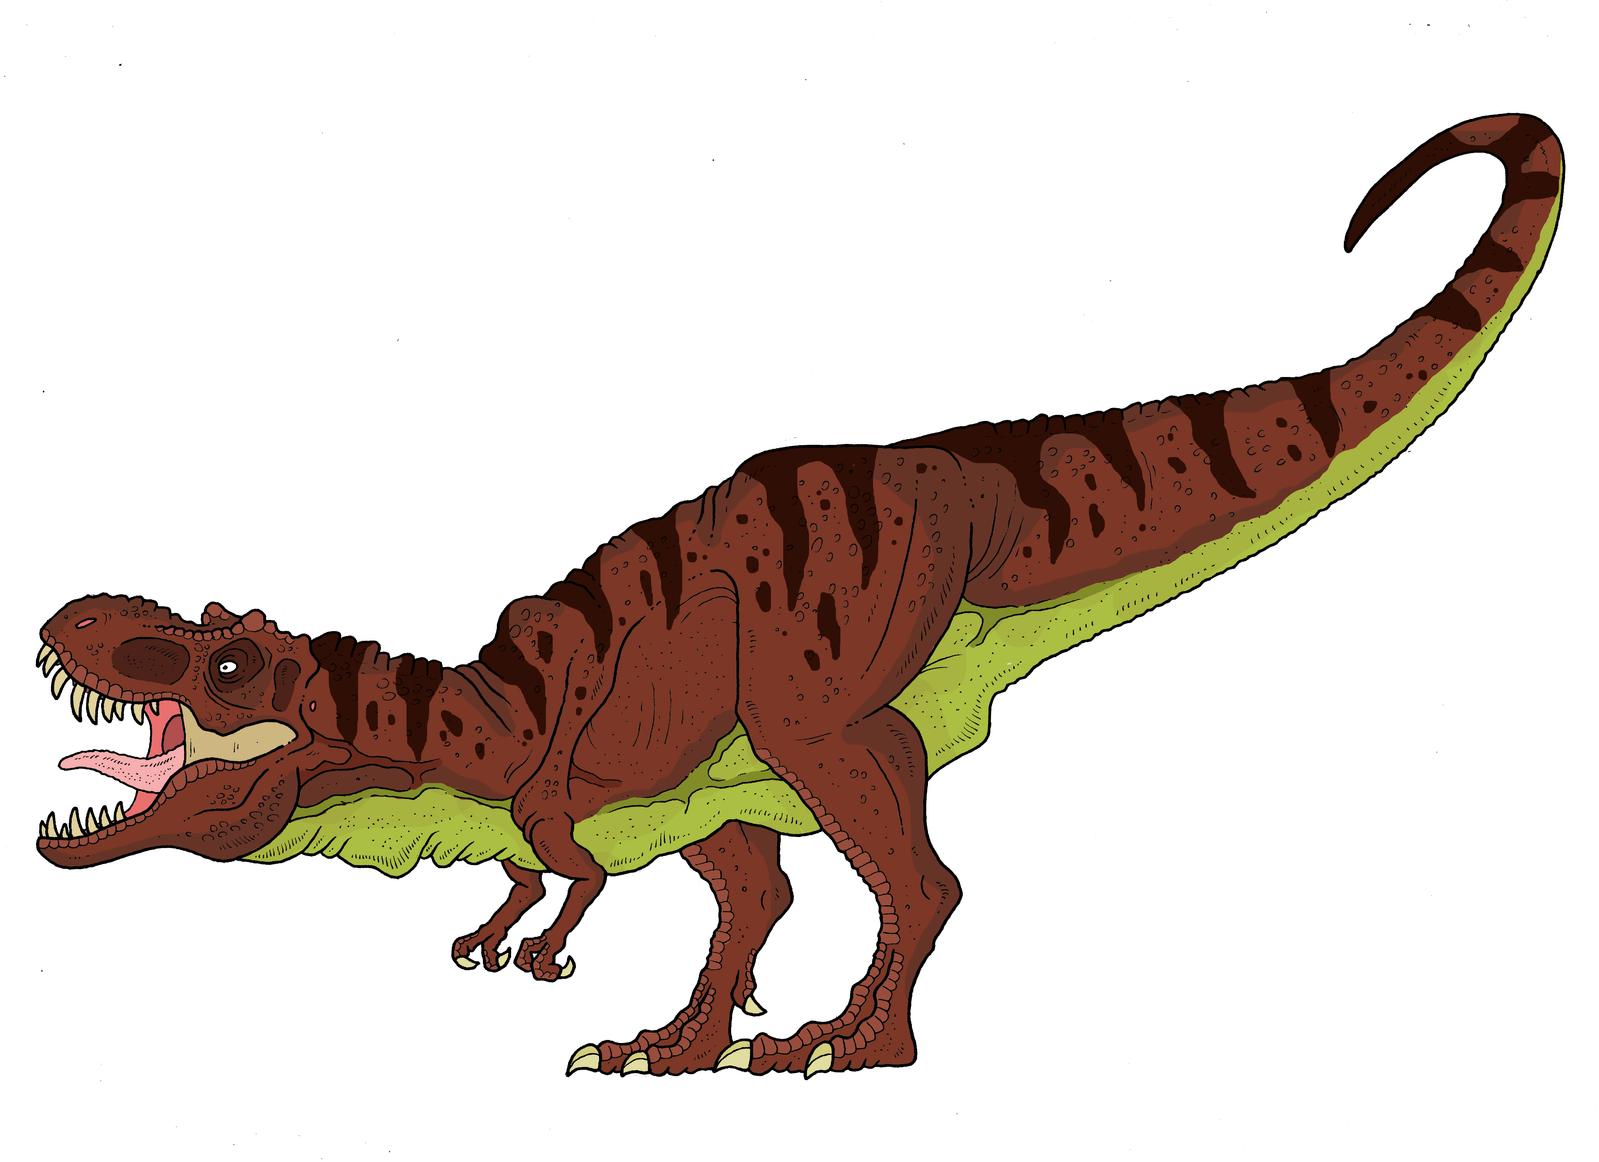 Jurassic Park (novel): Tyrannosaurus rex by ...